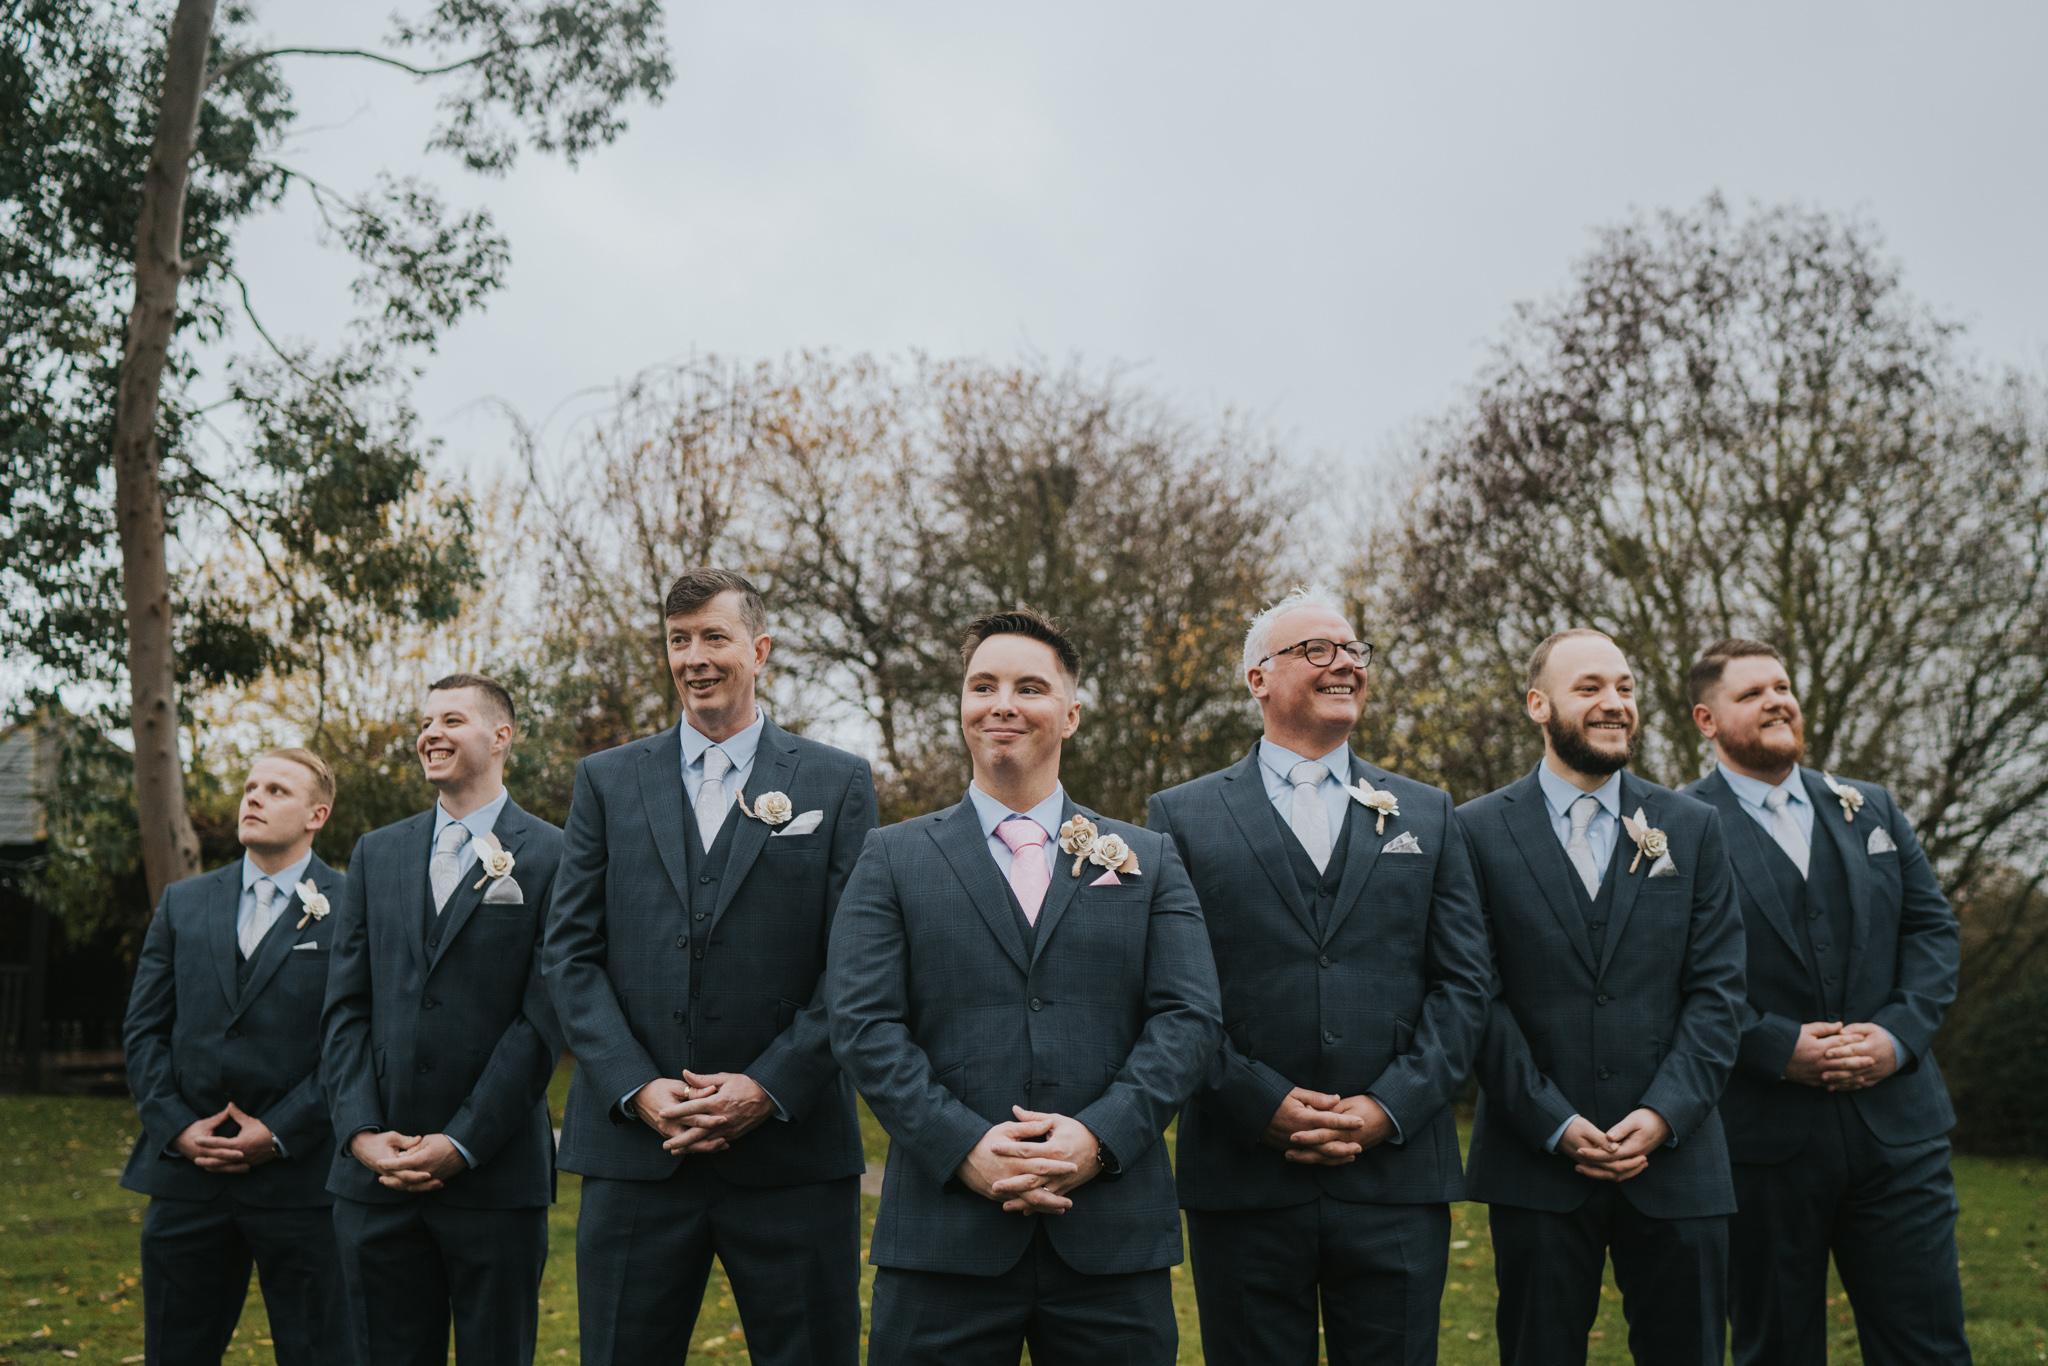 rhia-james-rustic-crabbs-barn-vintage-50s-retro-wedding-grace-elizabeth-colchester-essex-alternative-relaxed-wedding-family-photography-devon-suffolk-norfolk-essex (95 of 138).jpg